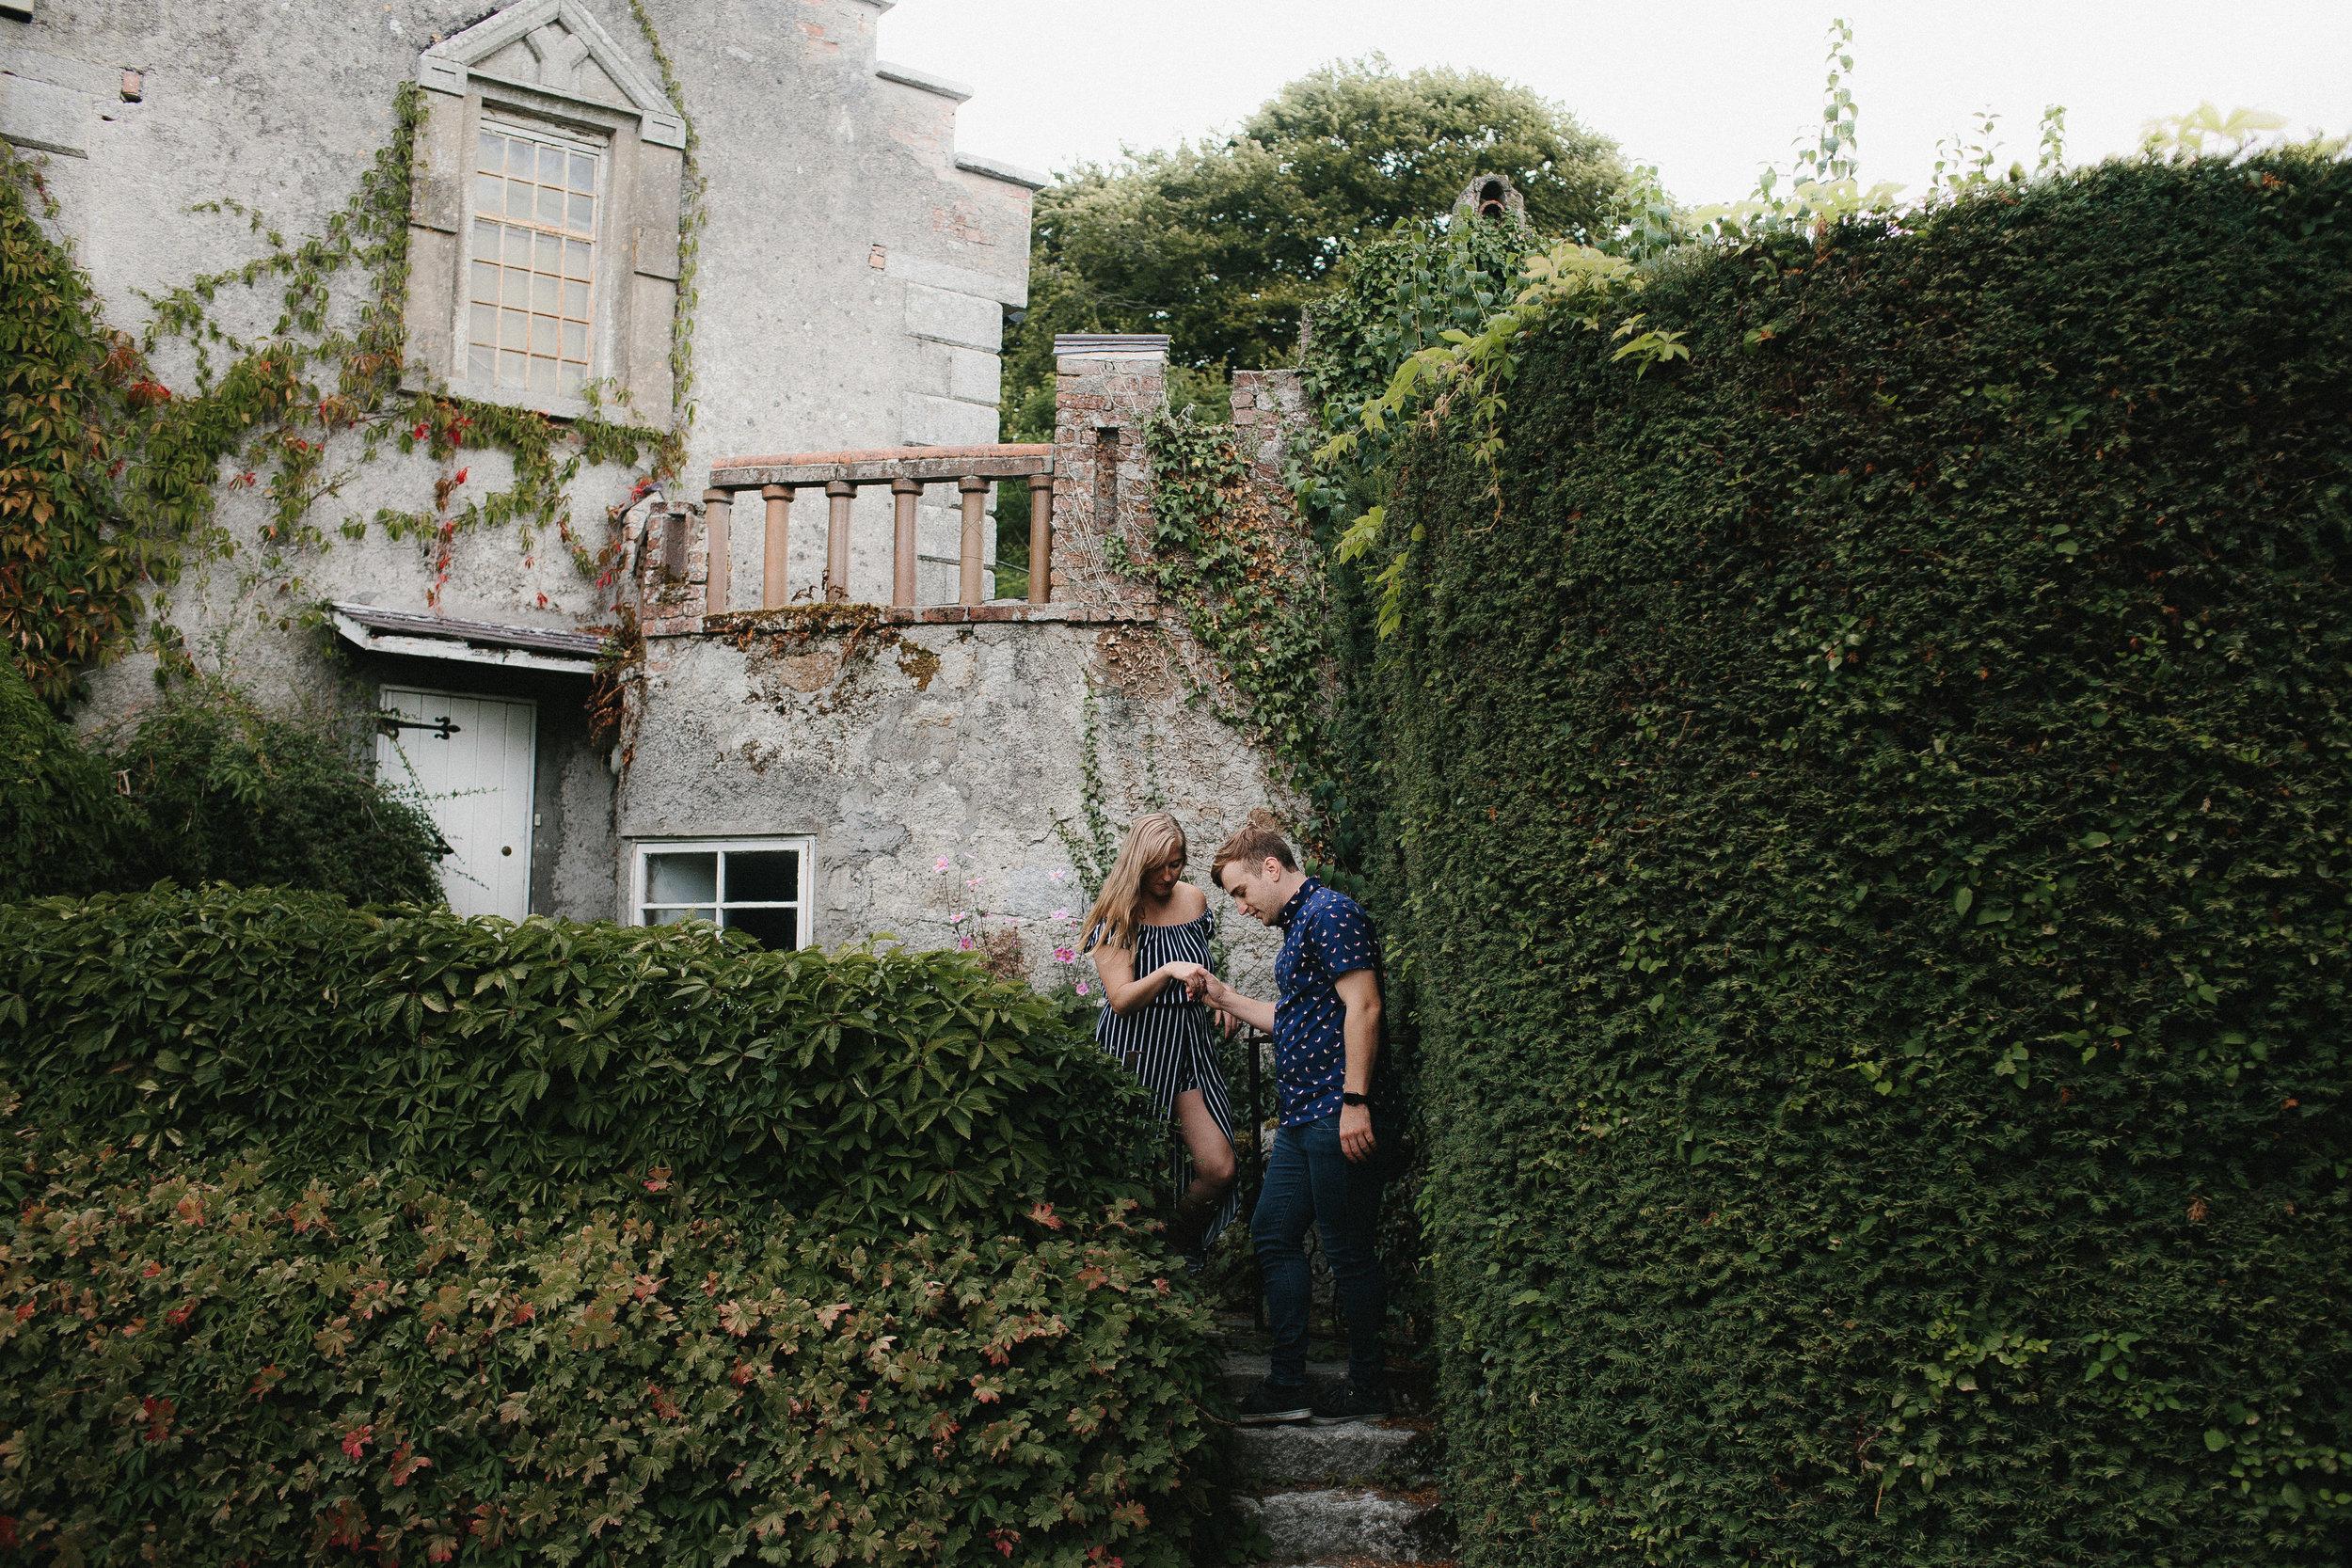 ireland_county_wicklow_glendalough_engagement_adventure_photography_windy_moody_atlanta_wedding_photographer_1153.jpg